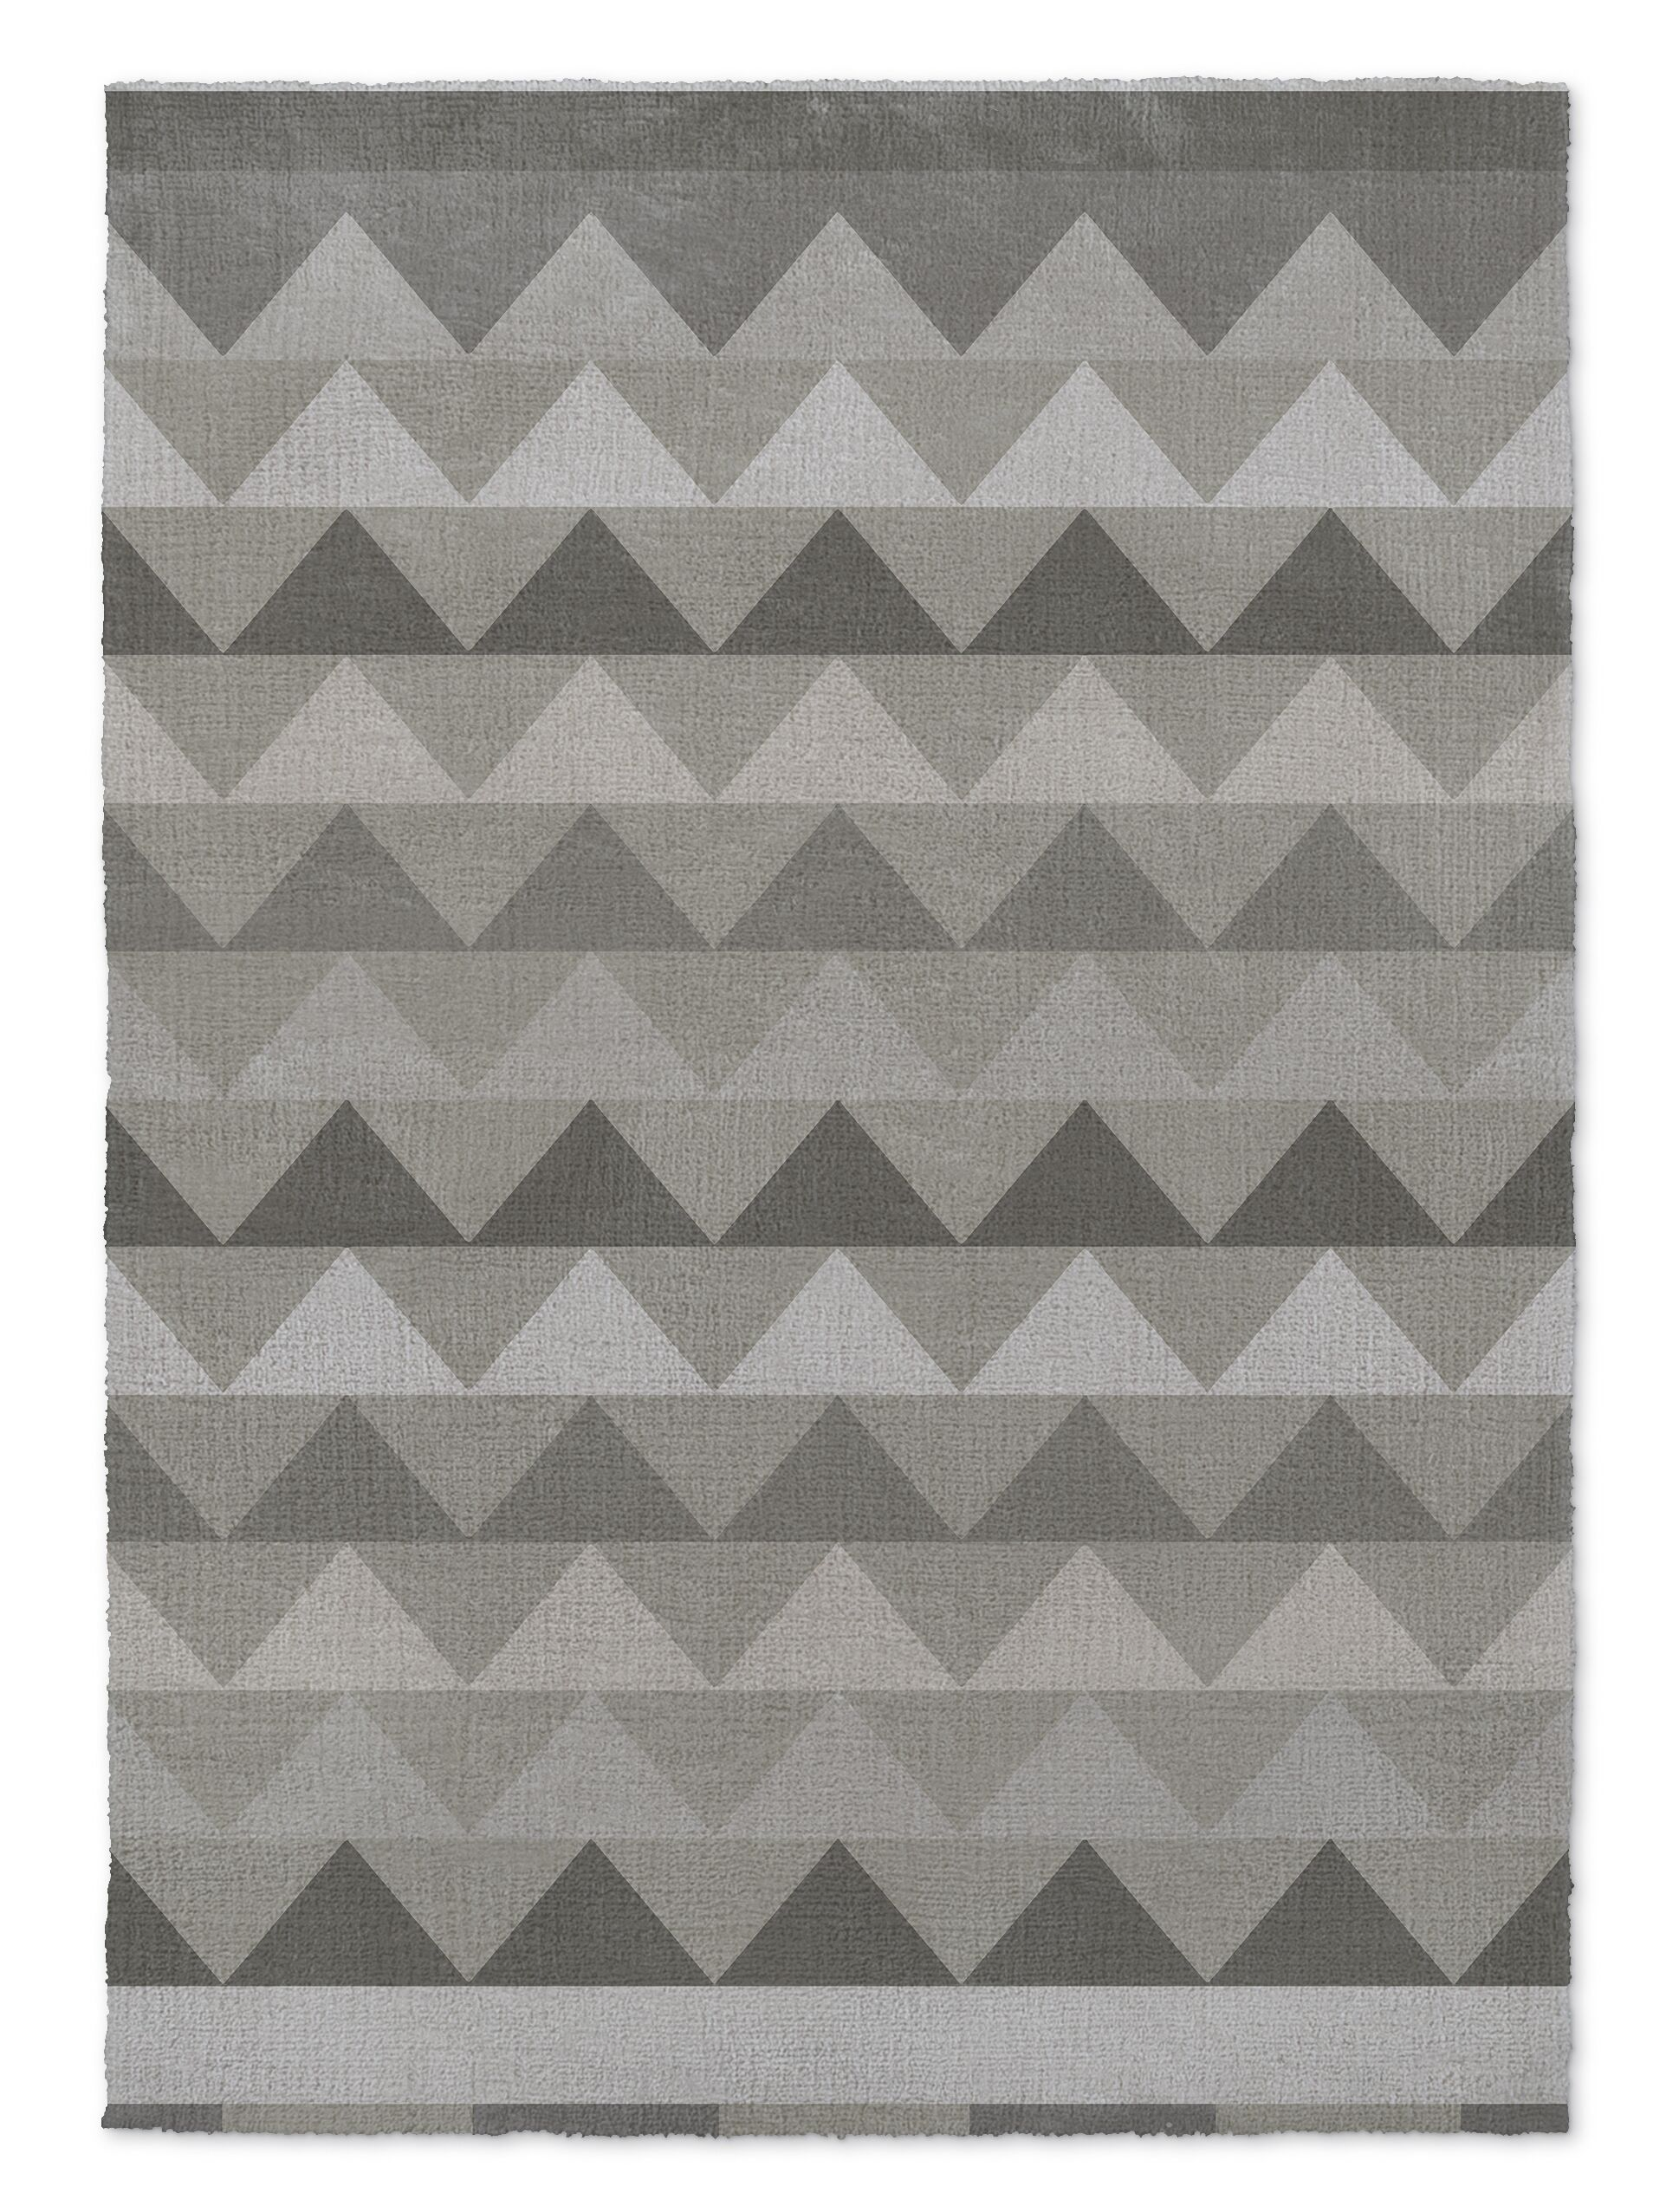 Gavin Gray Area Rug Rug Size: Rectangle 8' x 10'